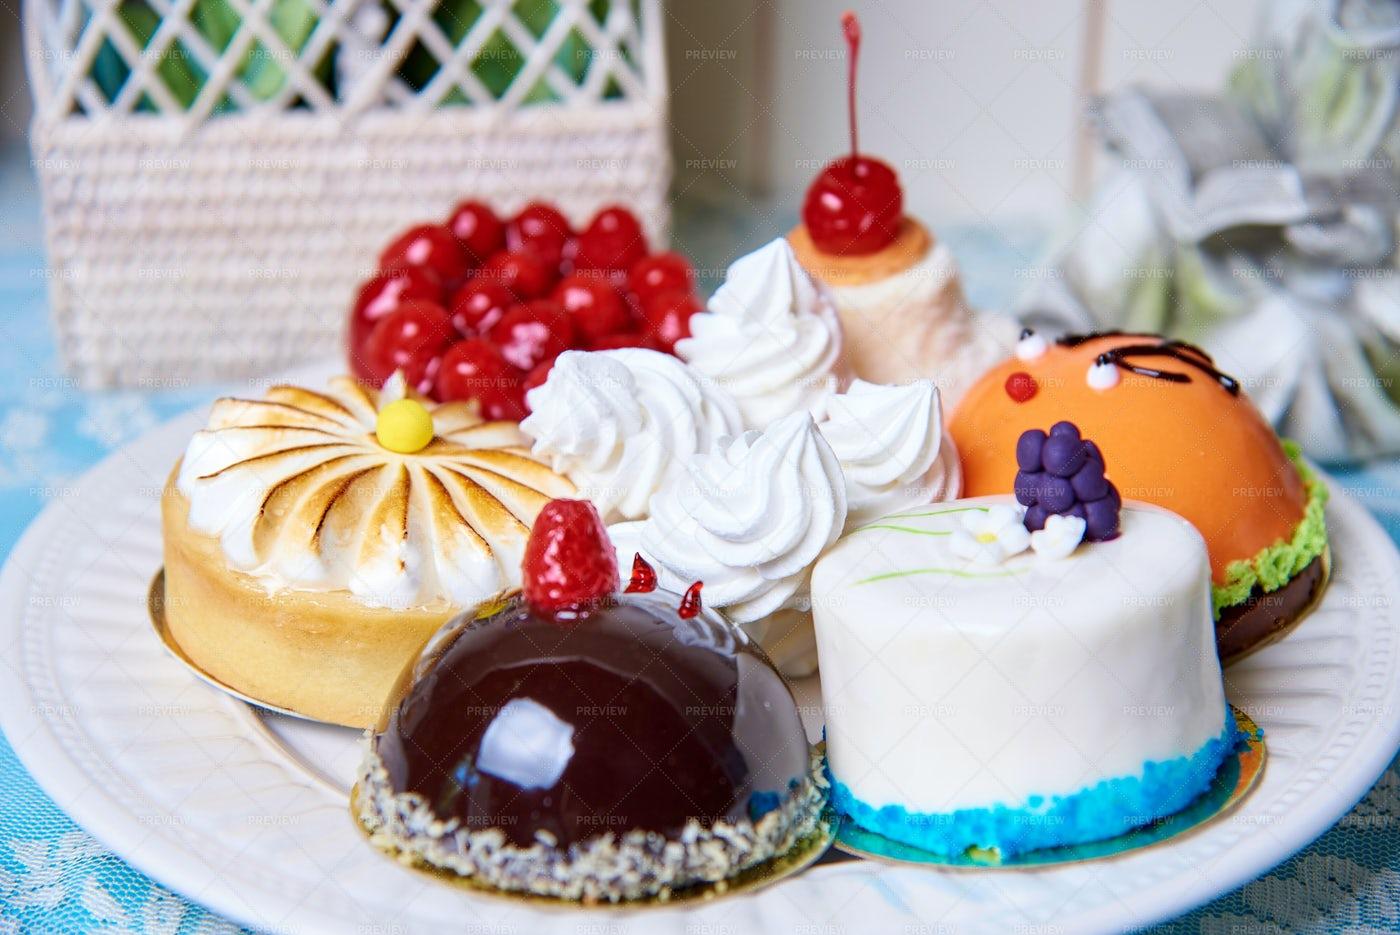 Variety Of Cakes: Stock Photos